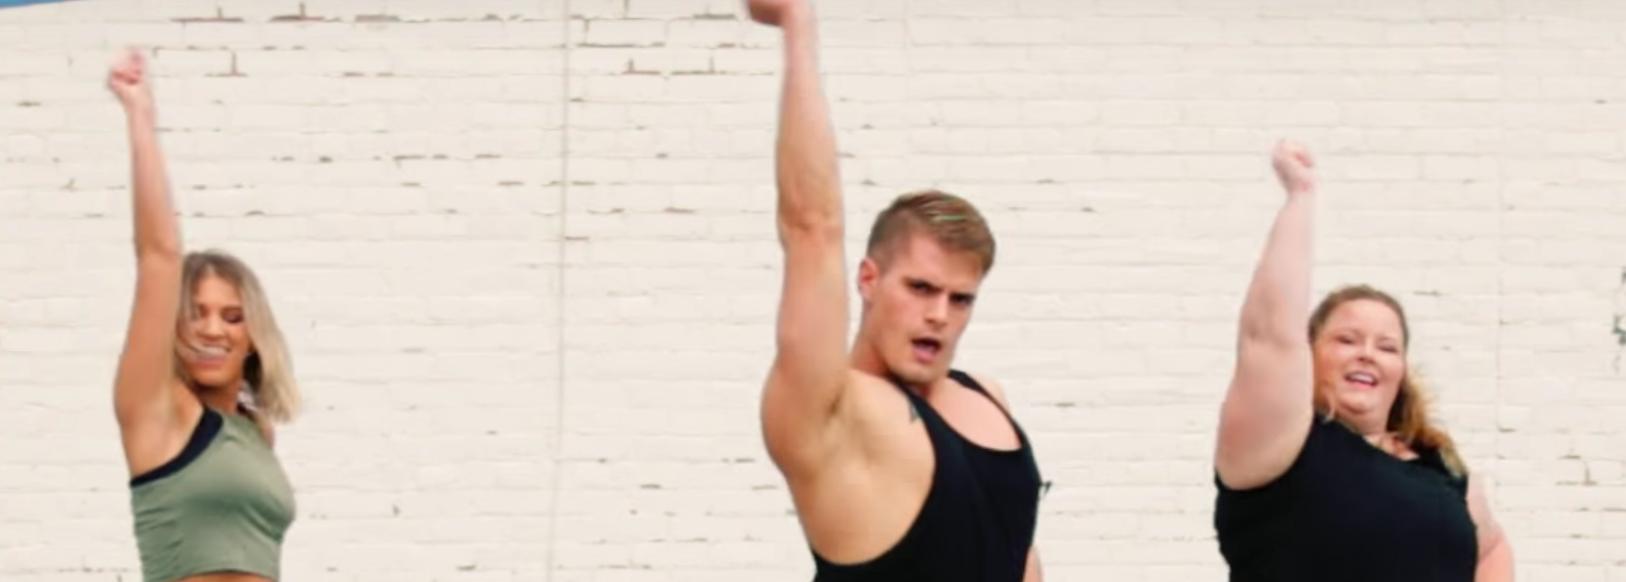 The Fitness Marshall: Me Too